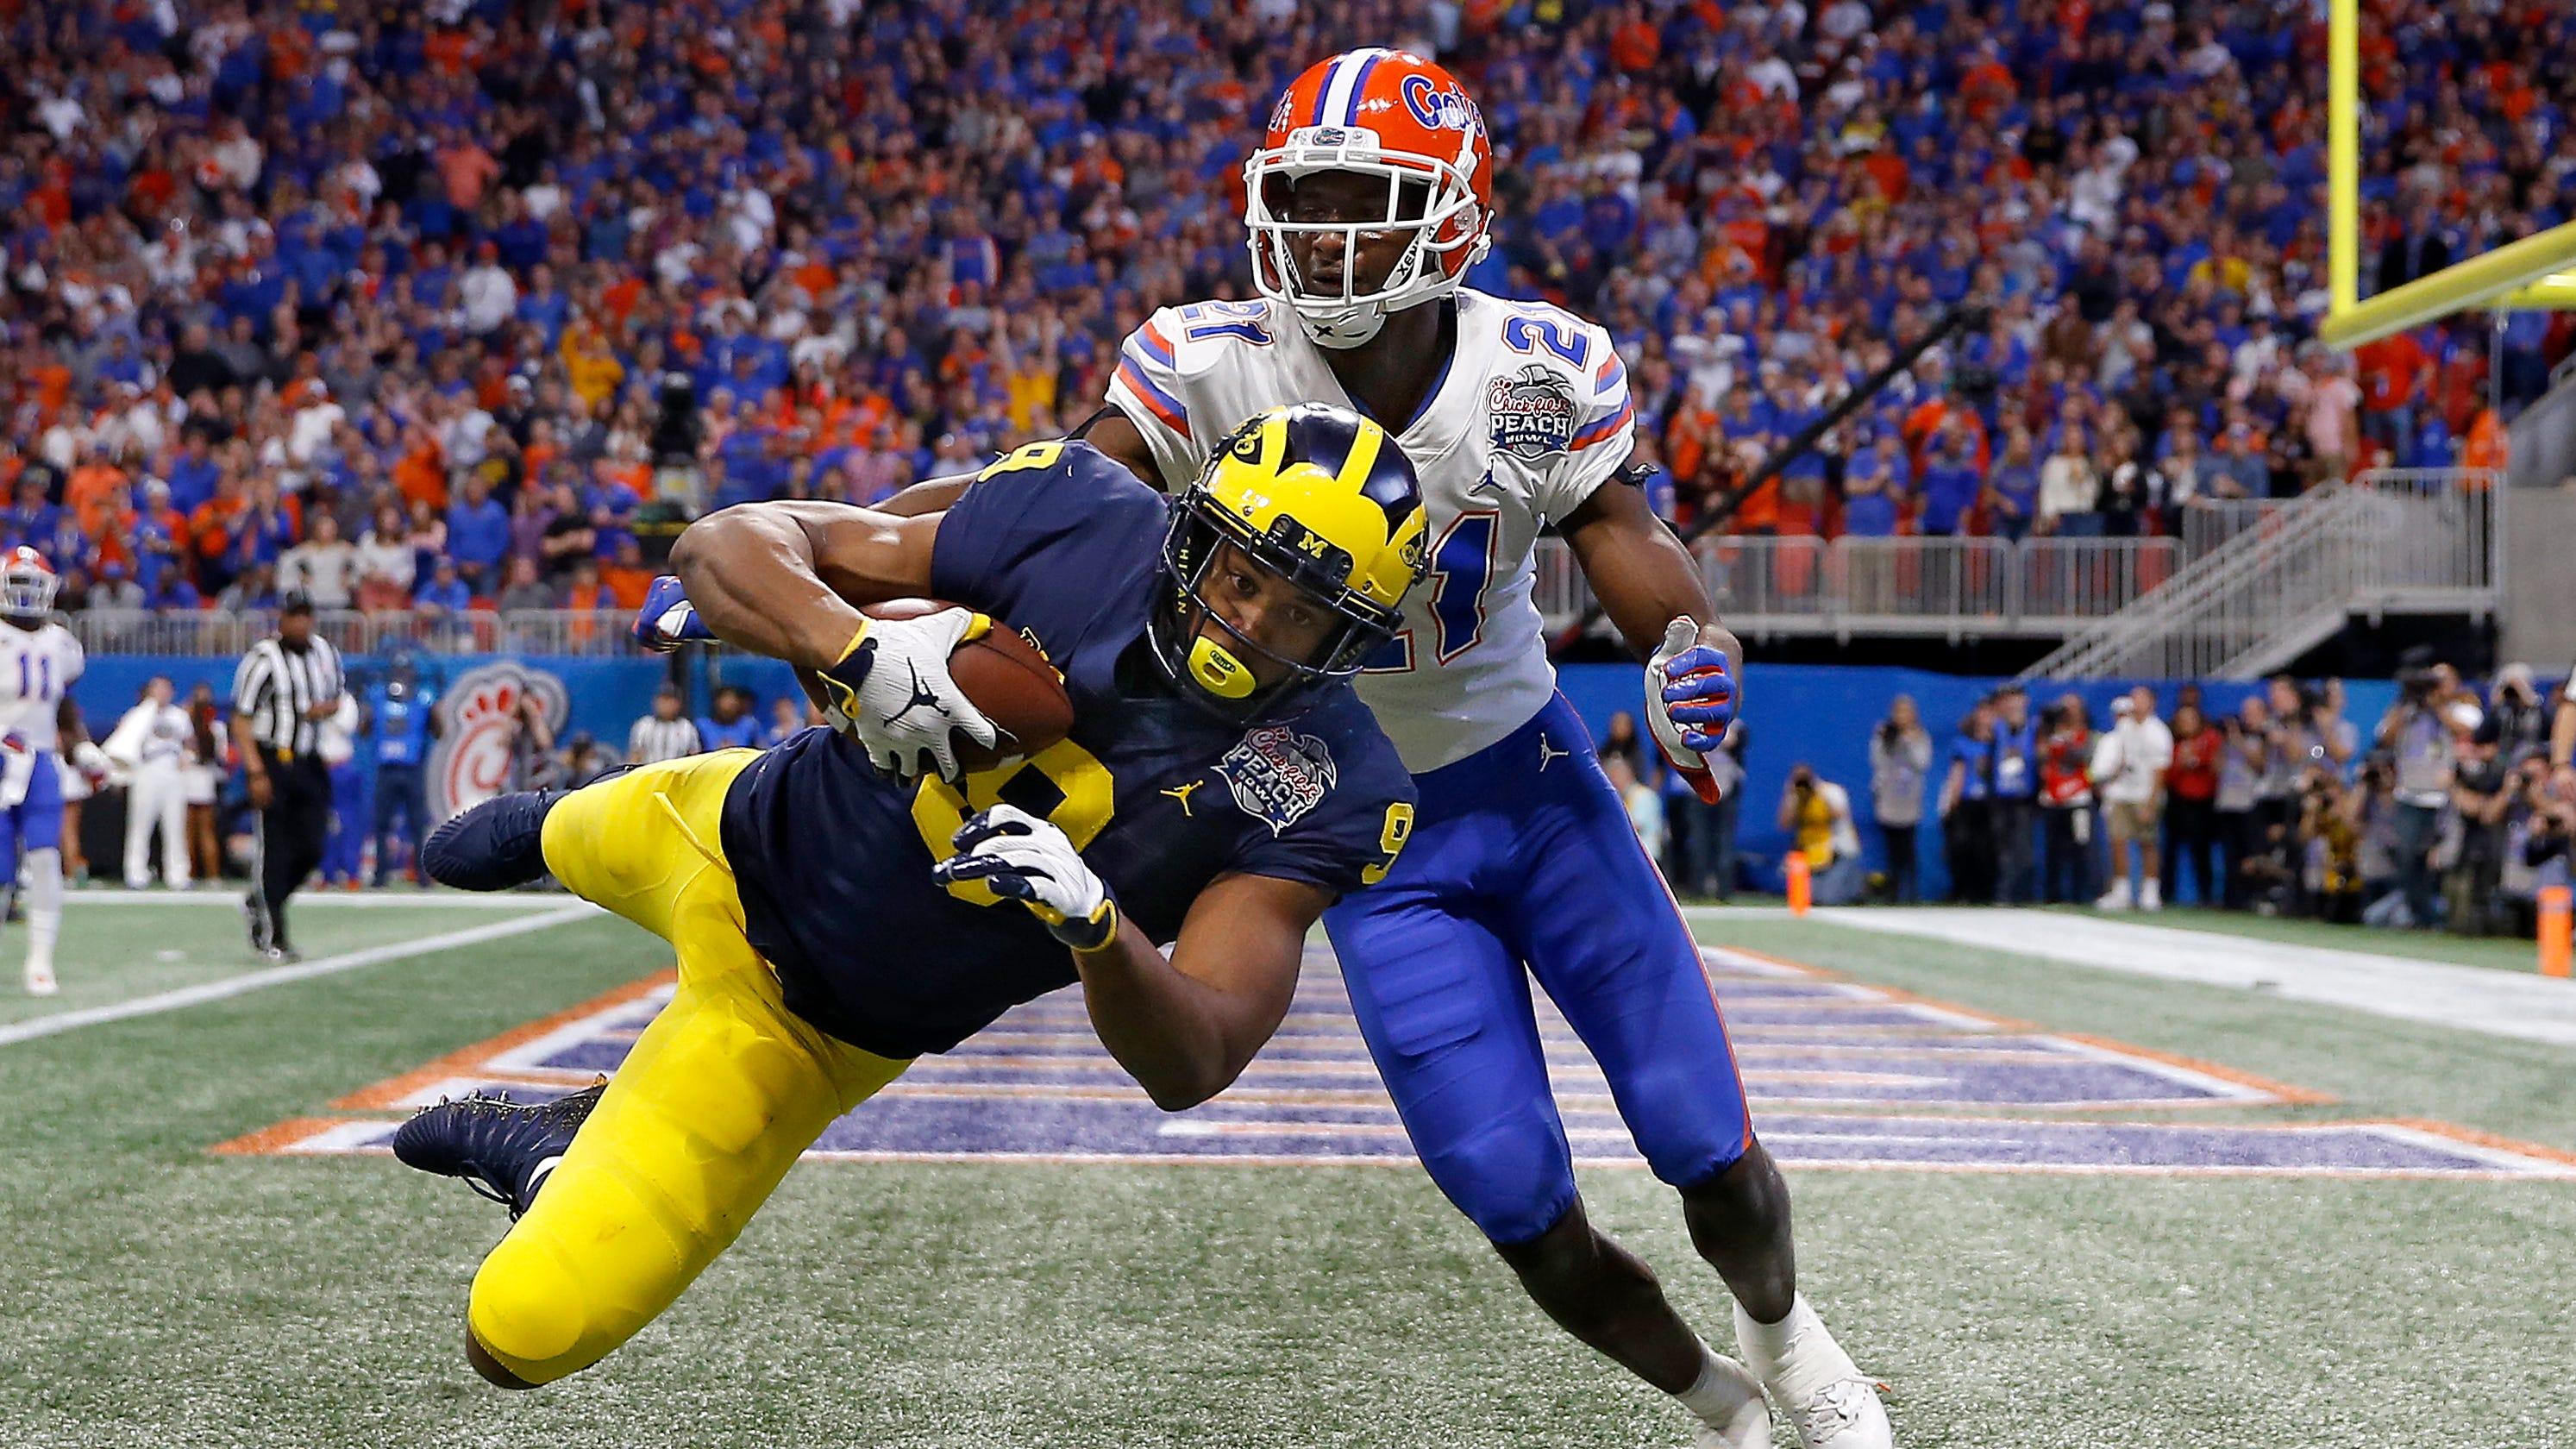 Michigan football injuries: WRs progressing, CB Thomas iffy